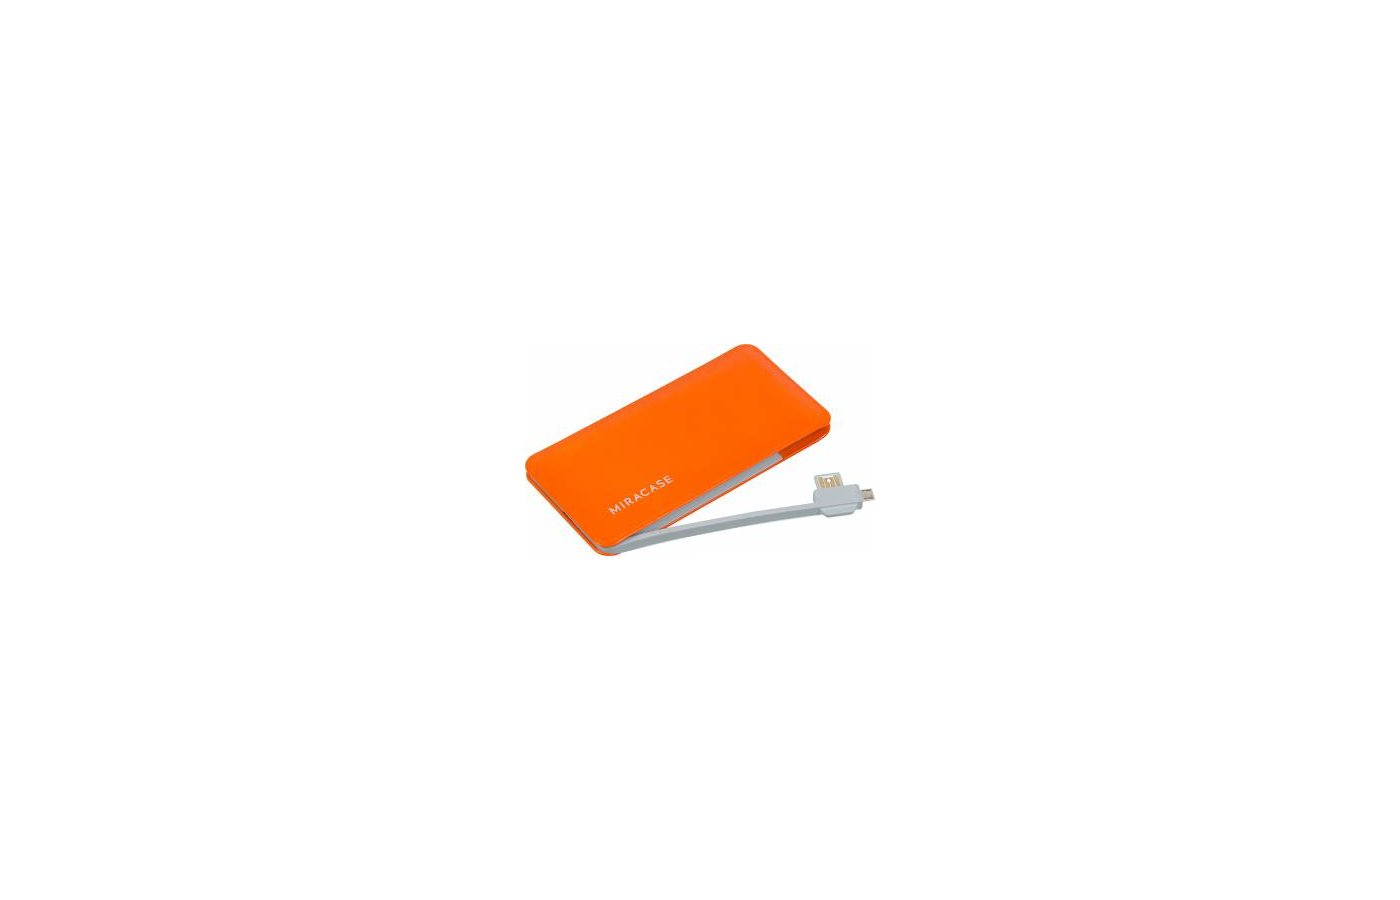 Портативный аккумулятор Miracase MACC-829 Li-Pol 6000mAh 2A оранжевый